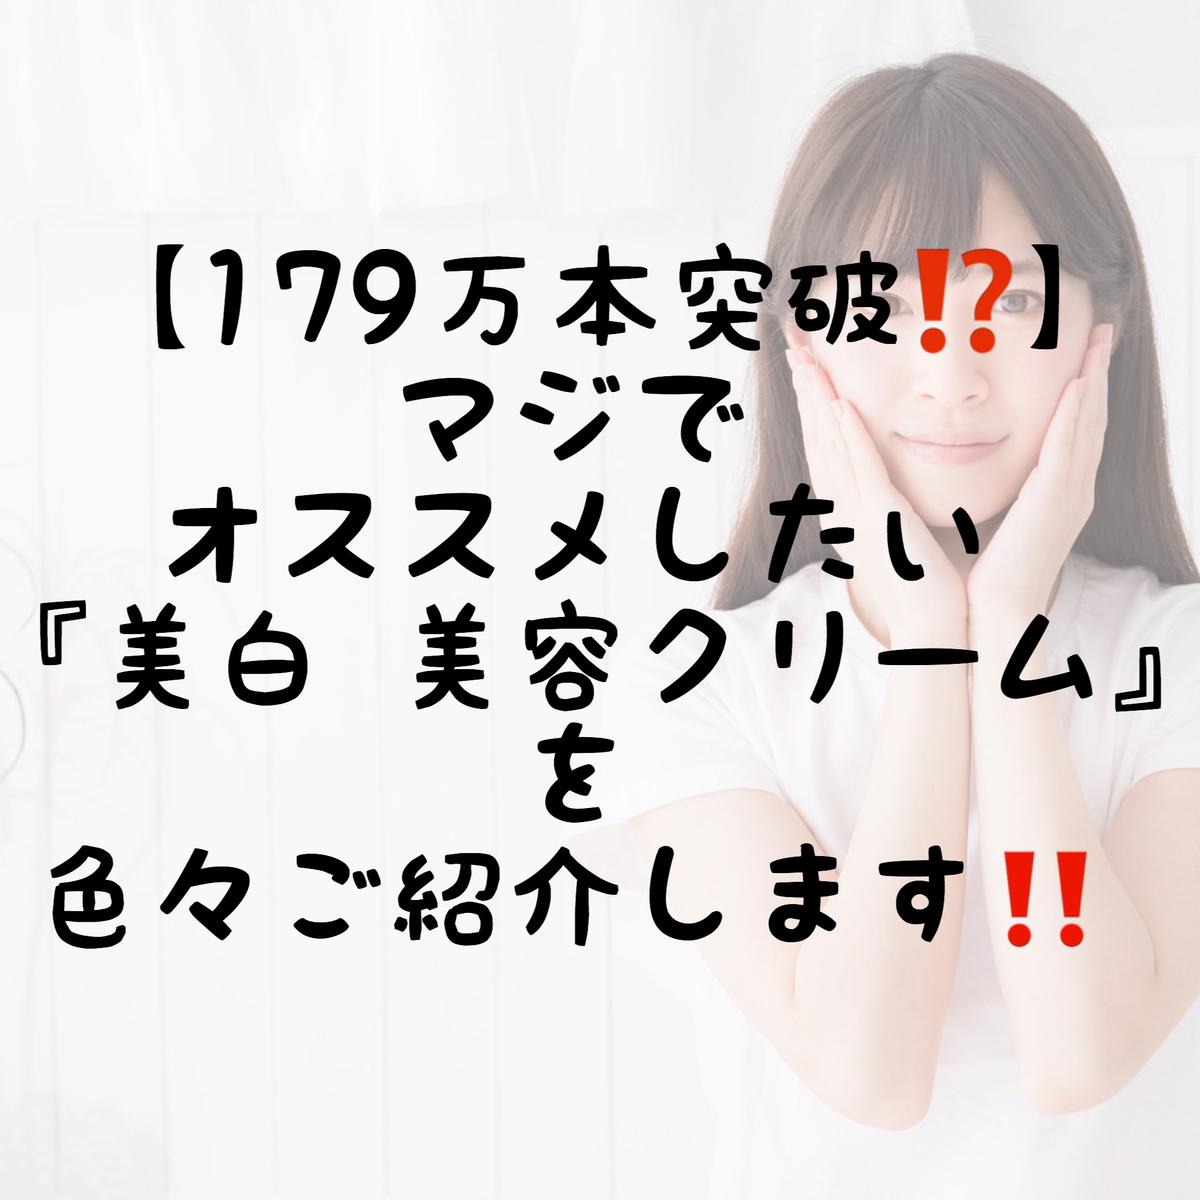 f:id:nokonoko_o:20200616133440j:plain